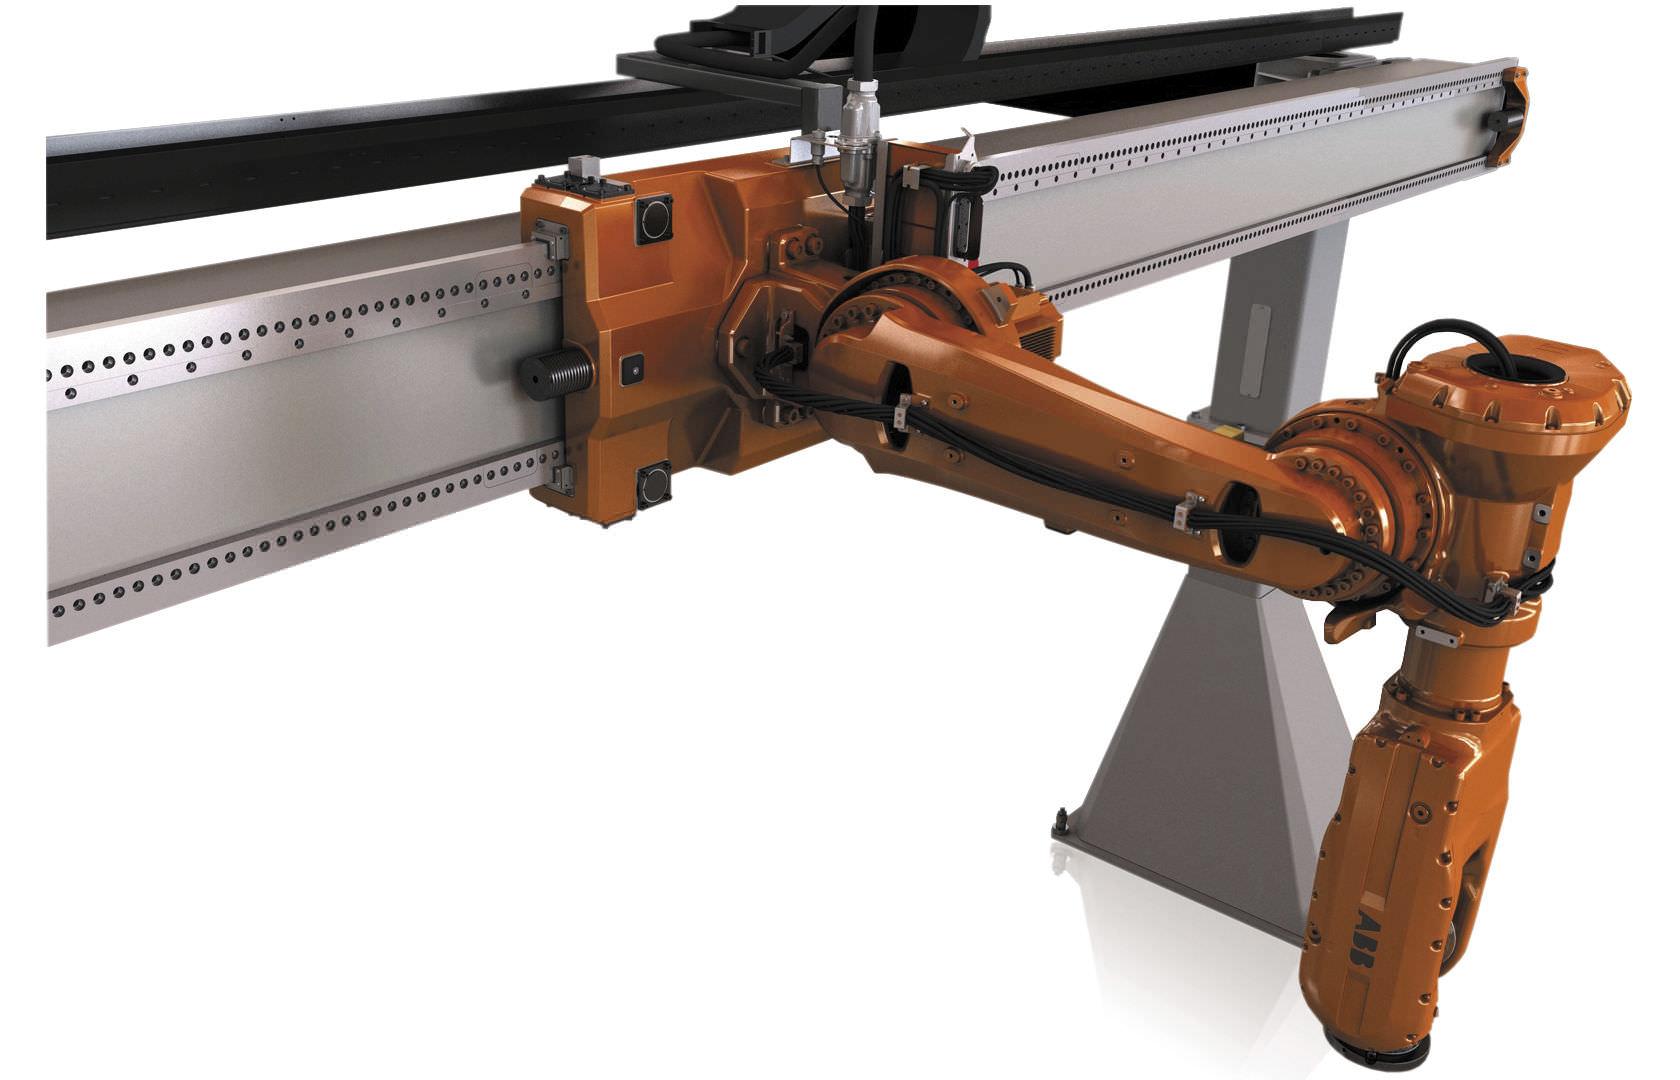 Промышленный робот ABB IRB 6620LX-1